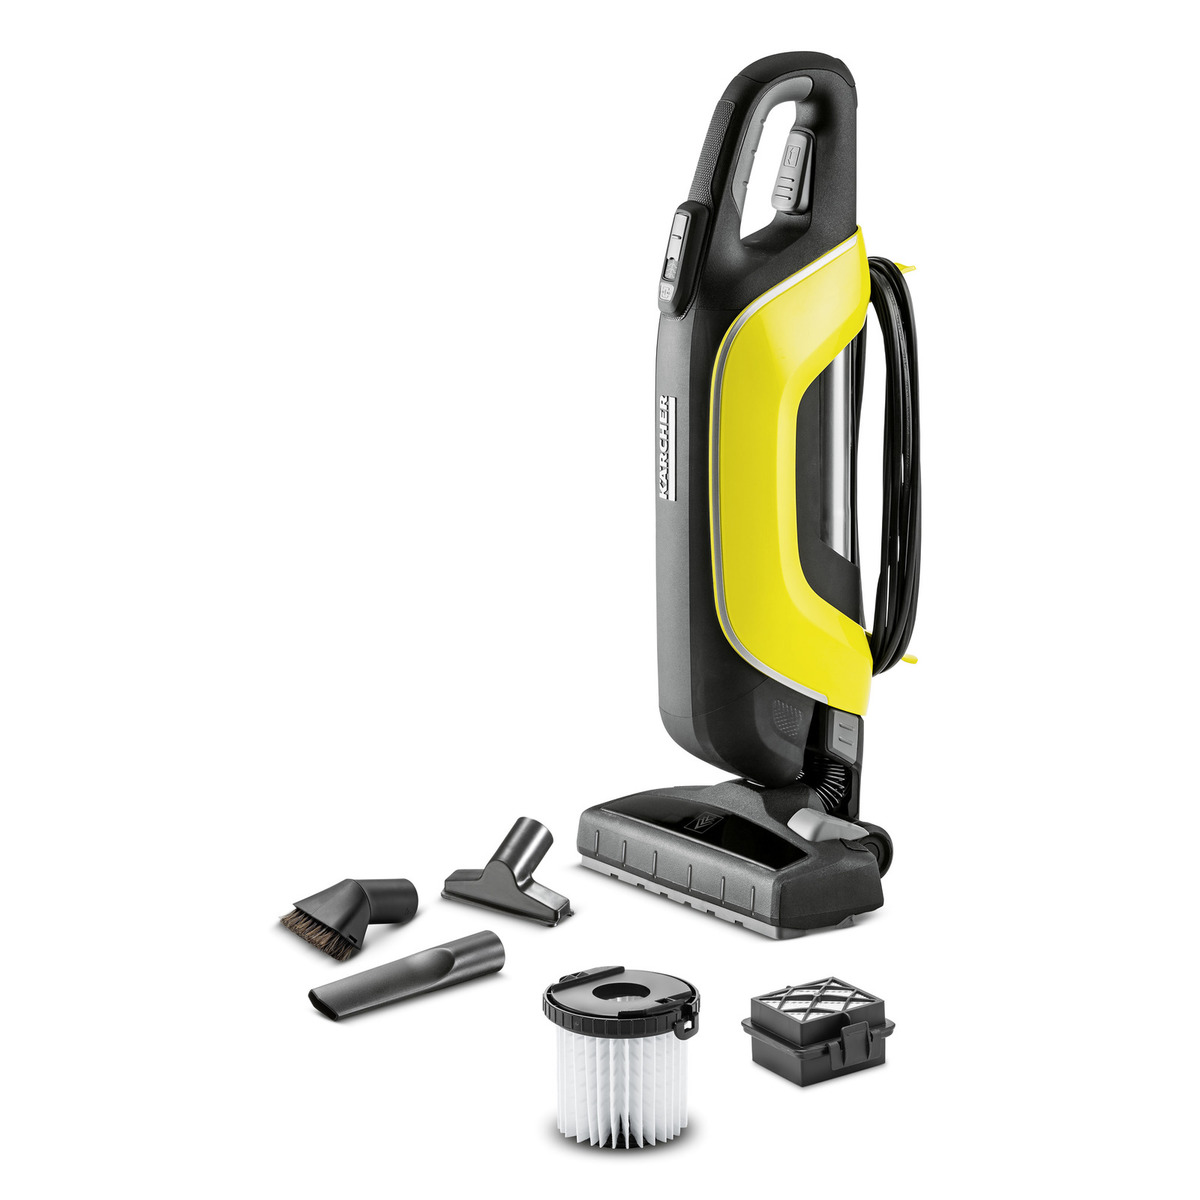 Karcher Vacuum Cleaner VC 5 Premium EU-I 1.349-150.0